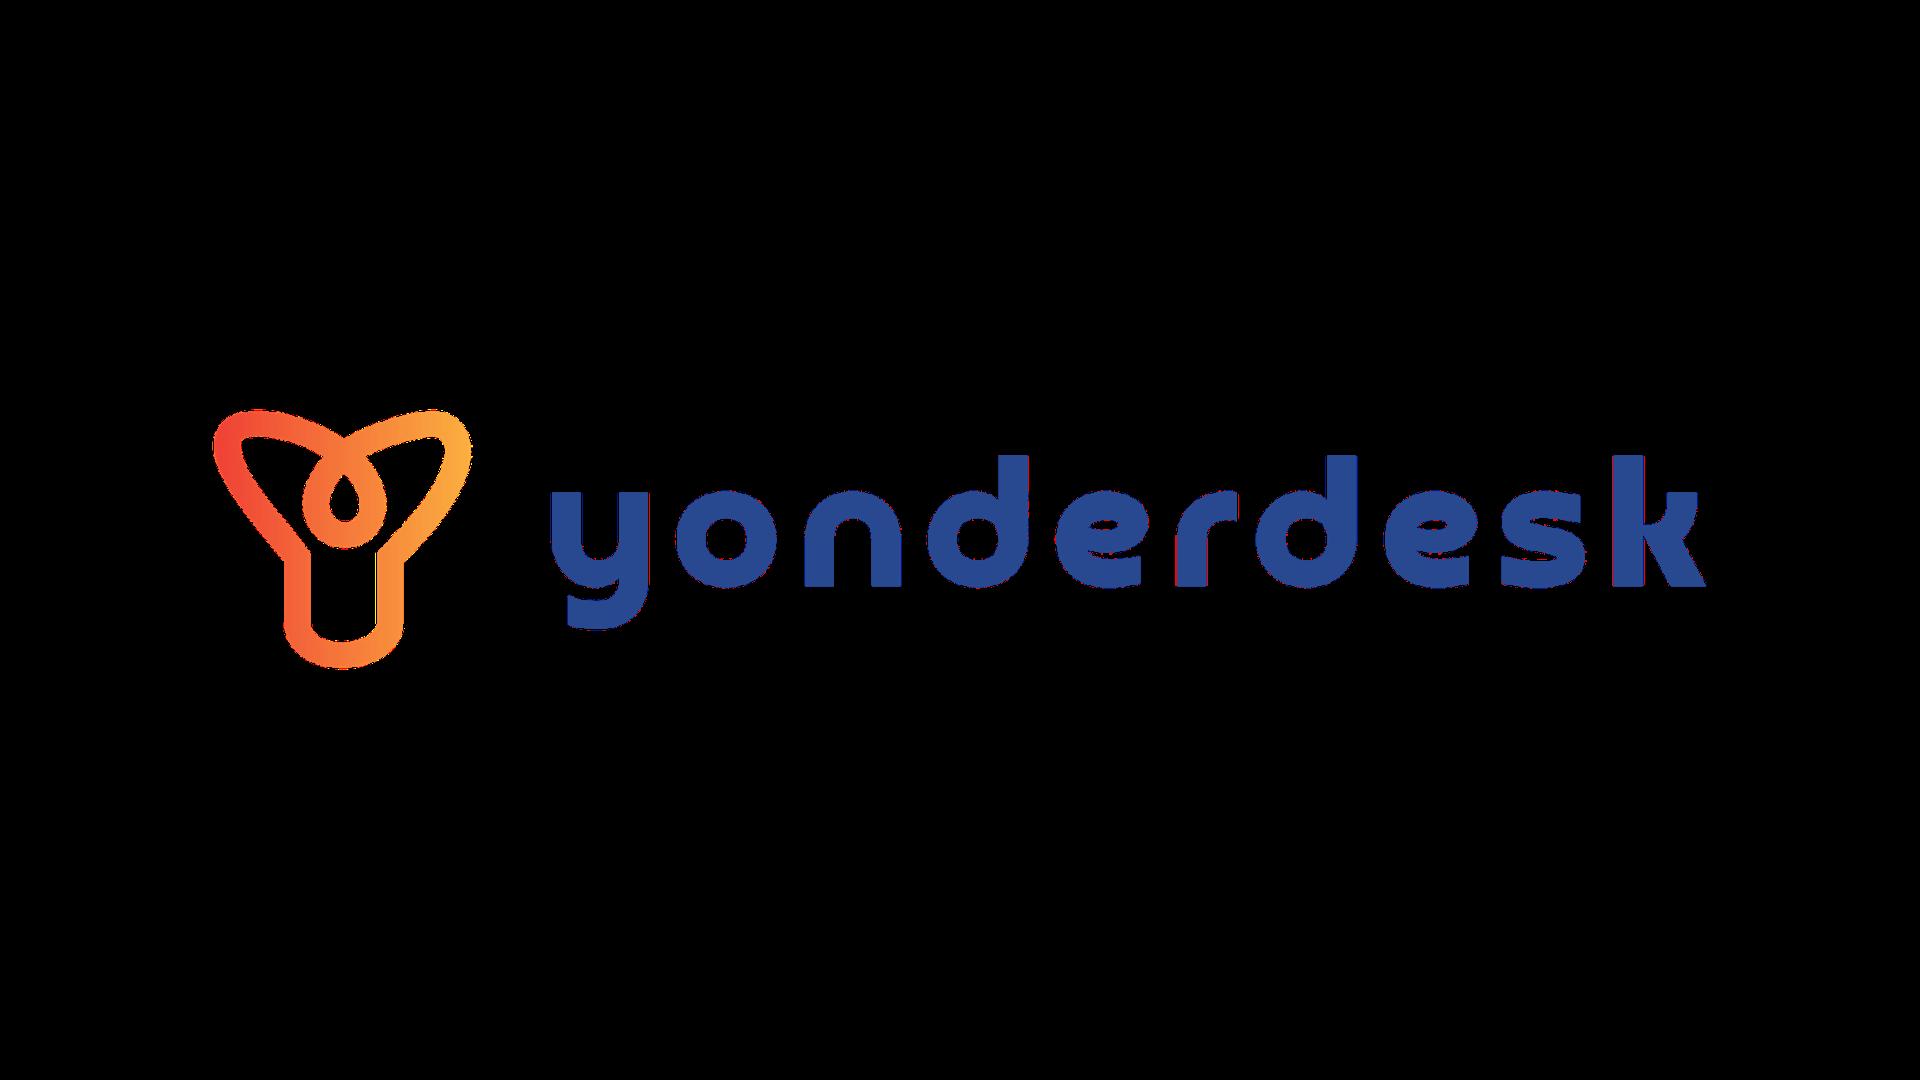 Yonderdesk